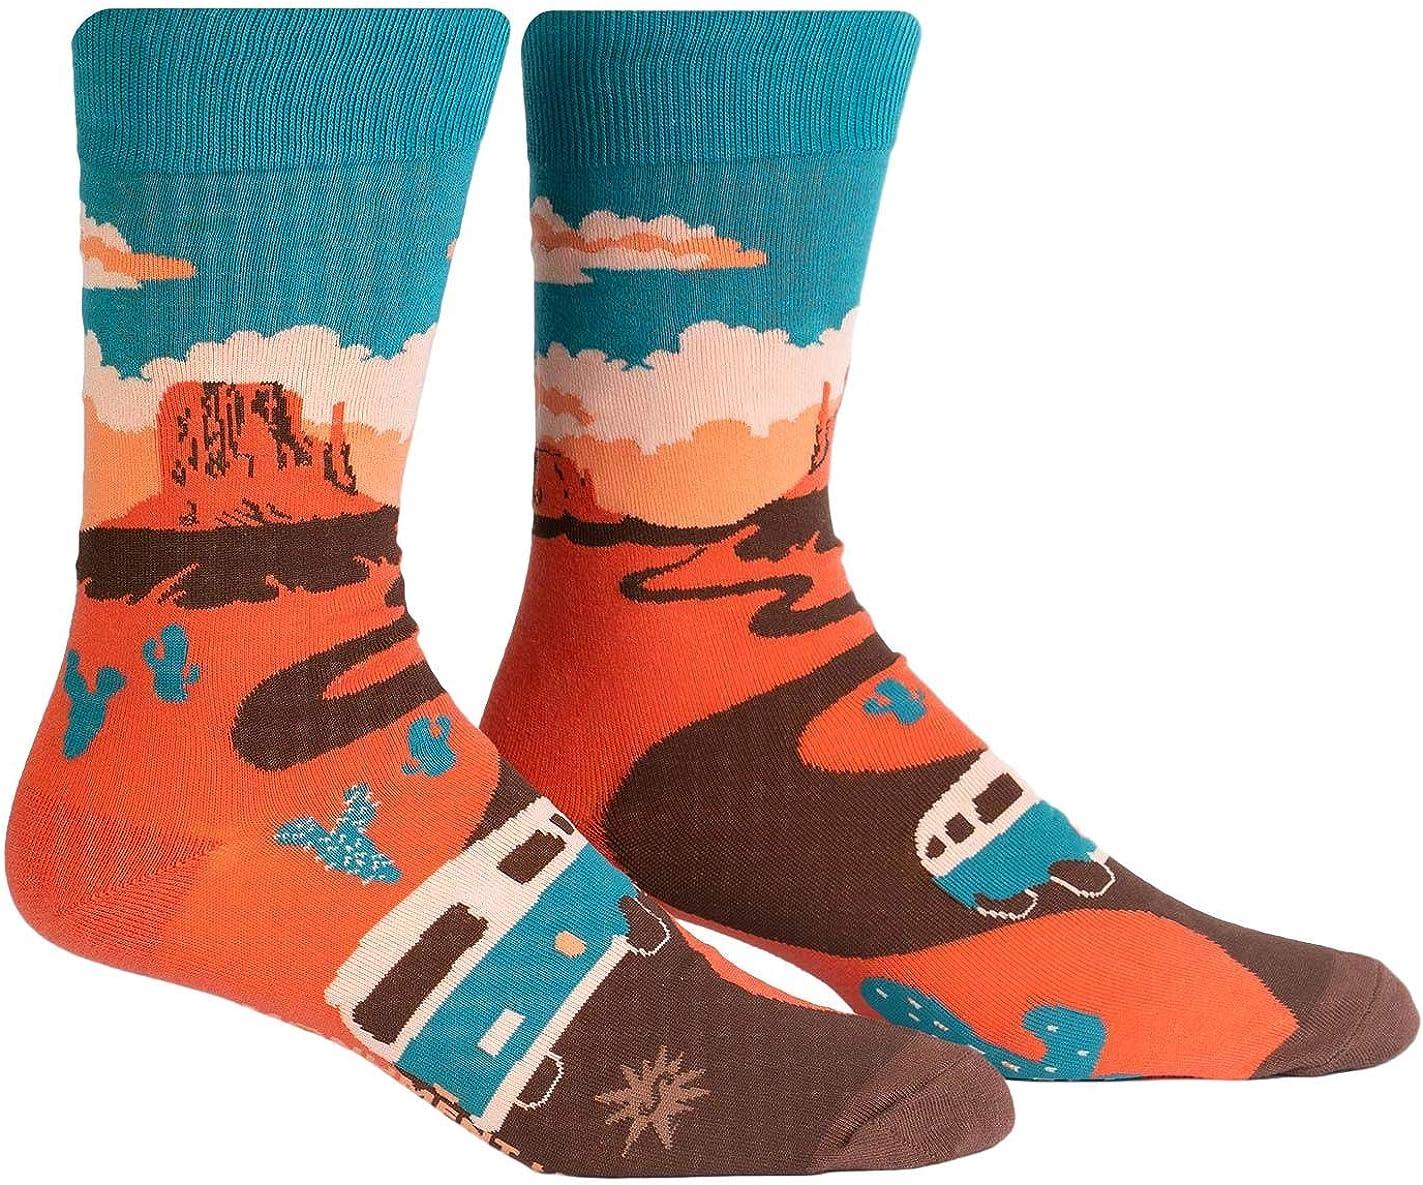 Sock It To Me Men's Crew National Park Socks